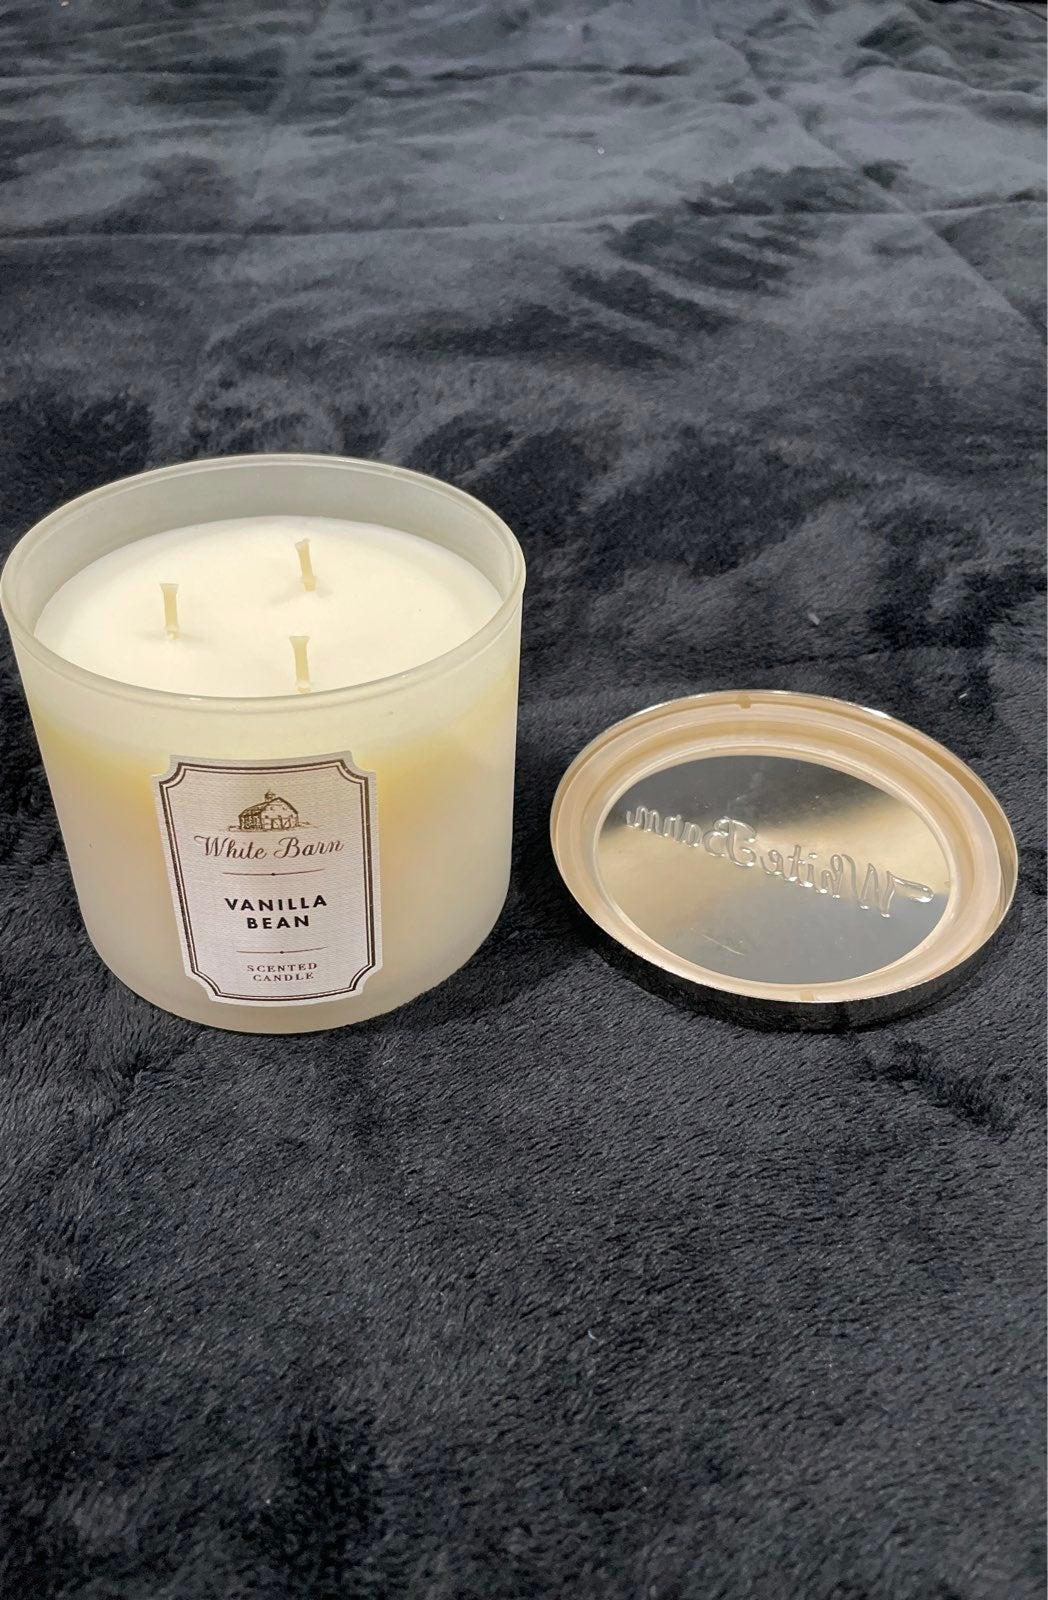 White Barn Vanilla bean candle